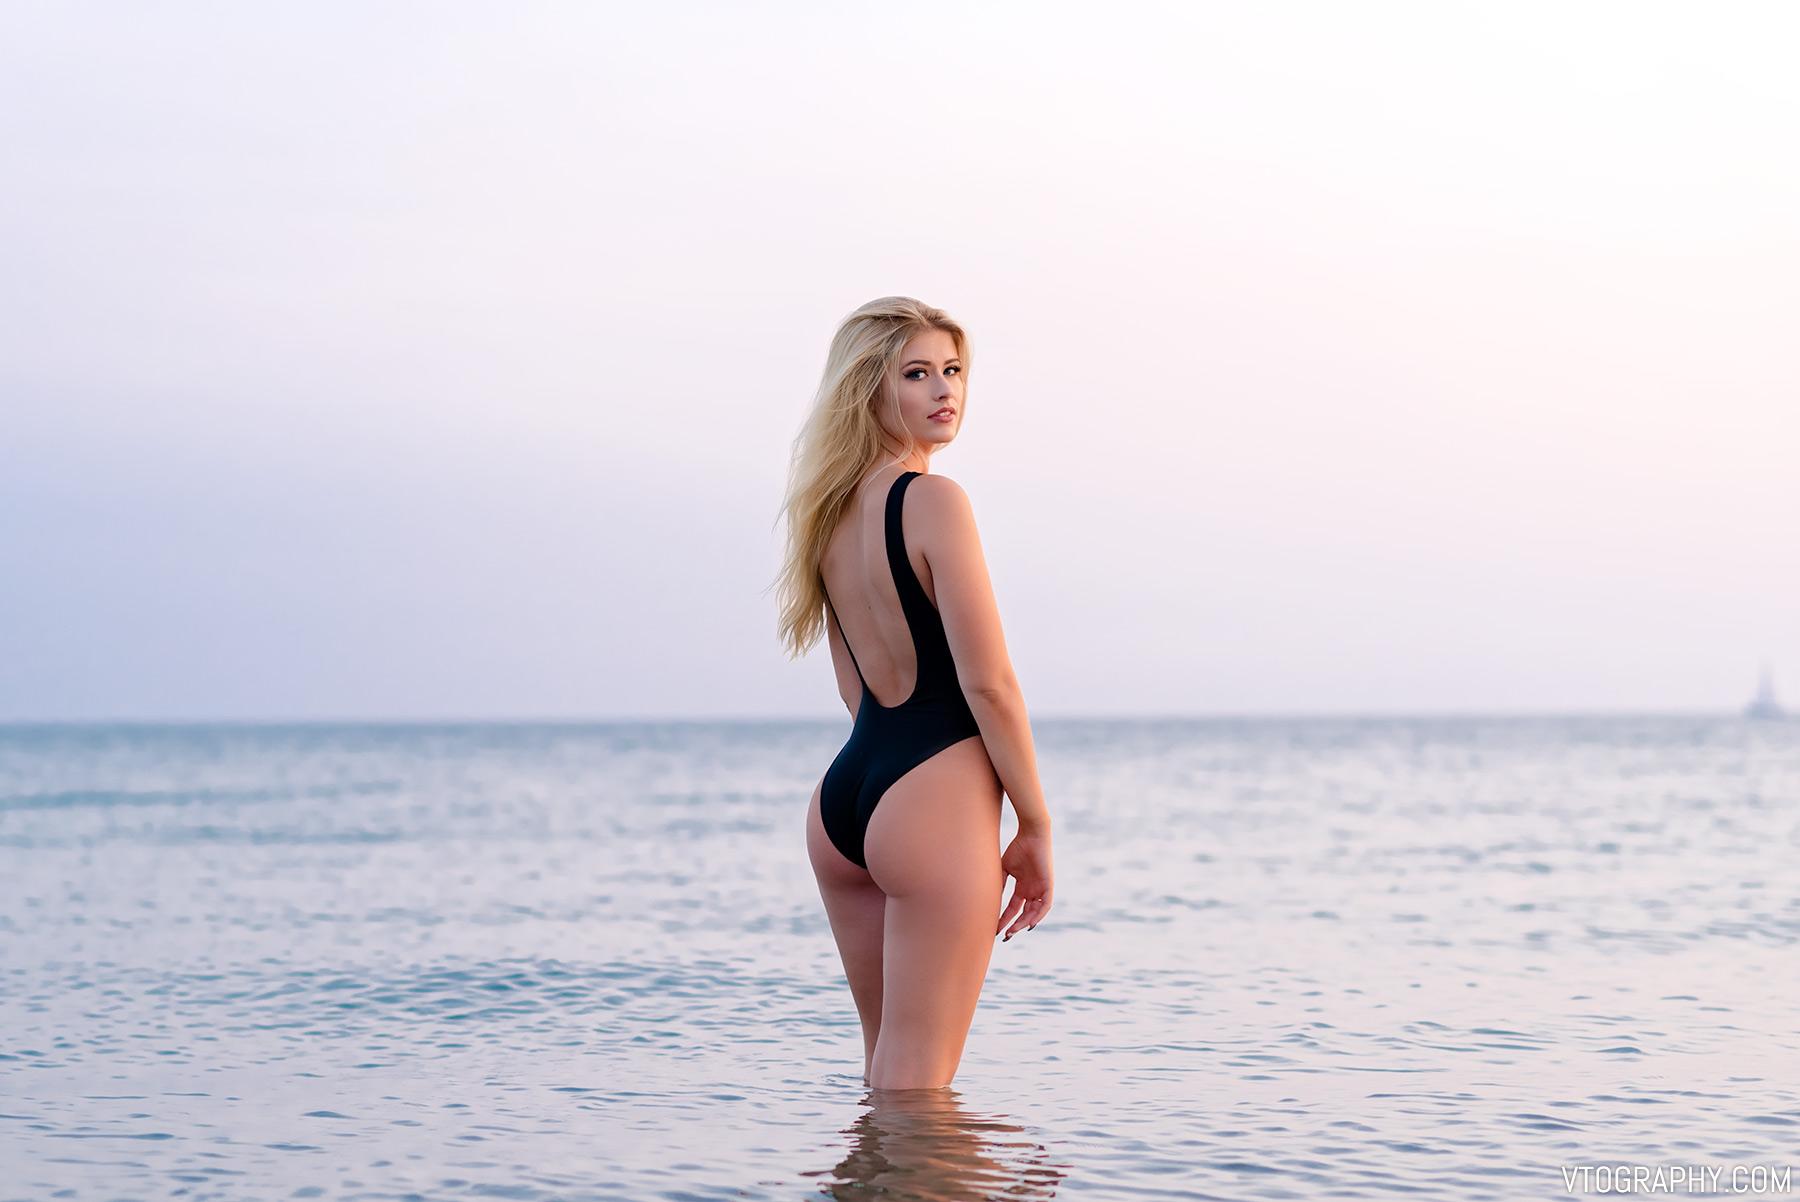 Beach photo shoot with model Sami